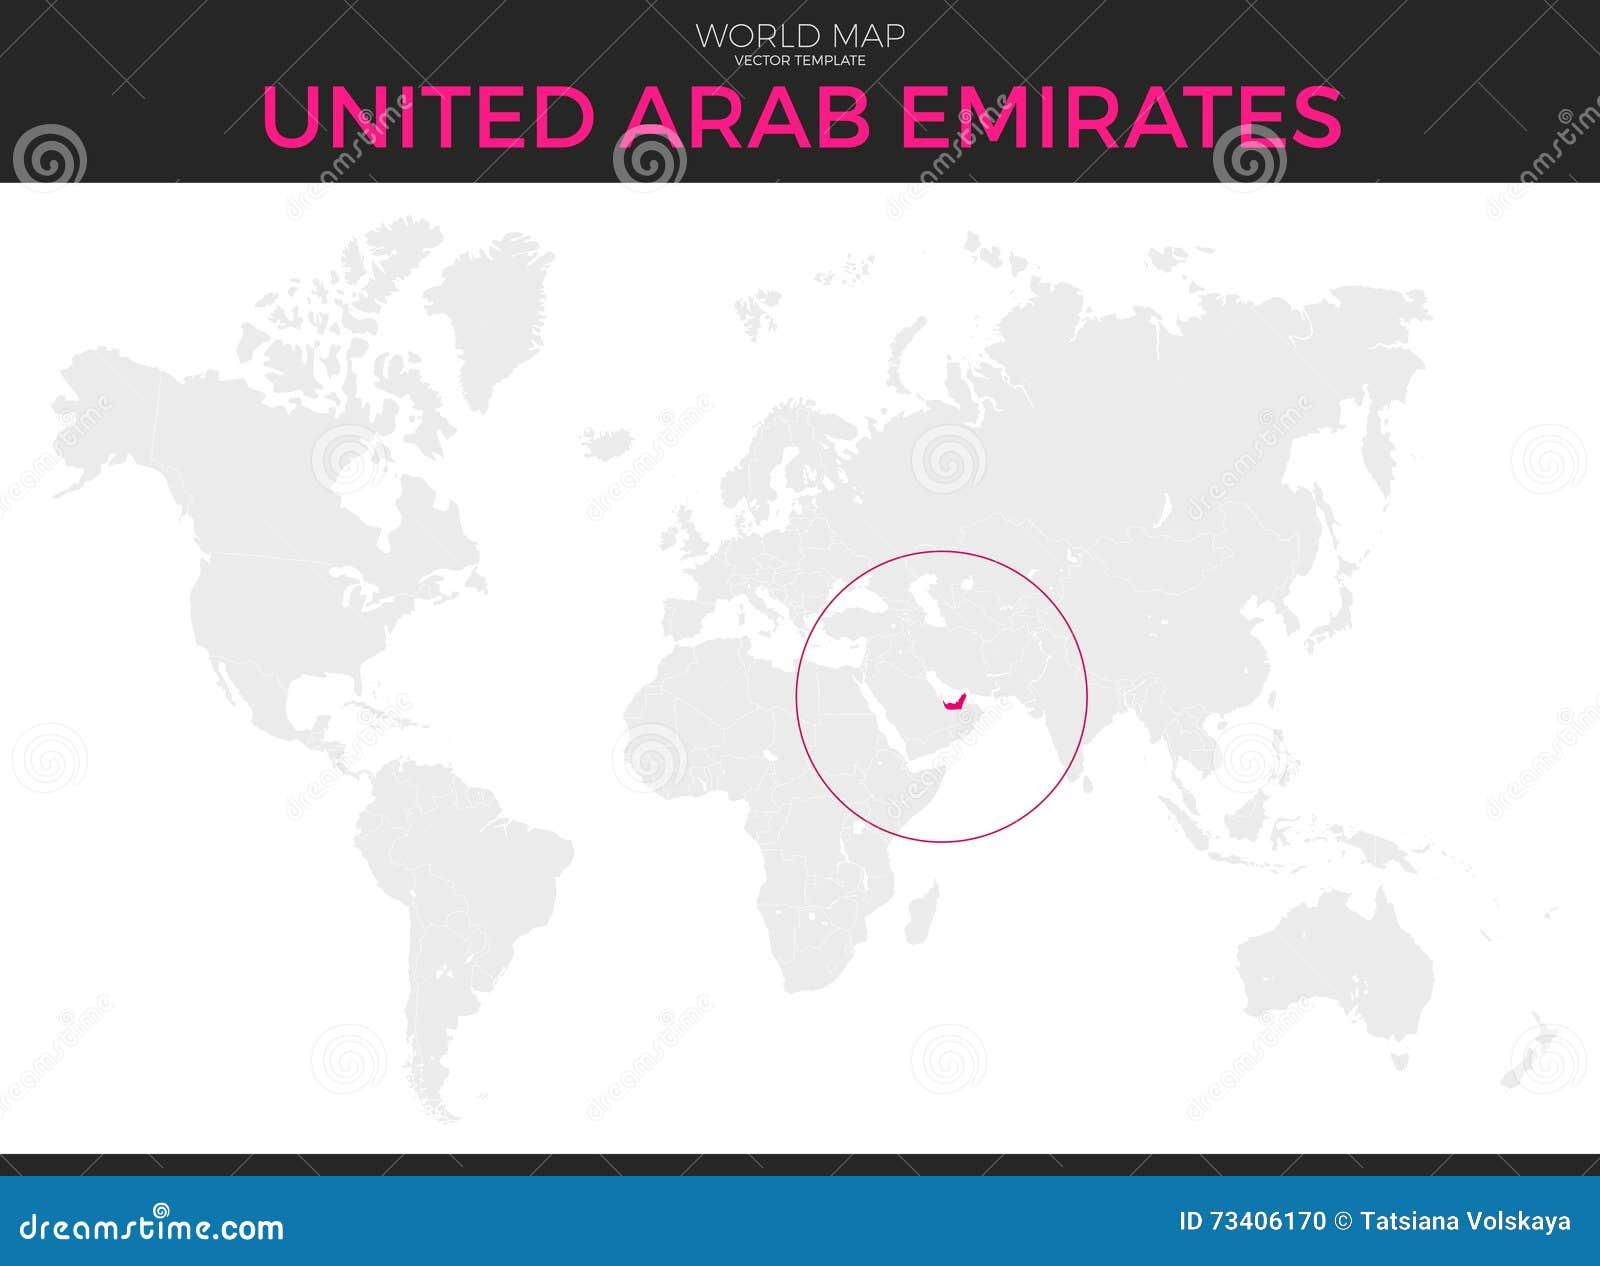 United Arab Emirates Location Map Stock Vector ... on afghanistan world map, sierra leone world map, norway world map, bahrain world map, china world map, persian gulf map, uganda world map, uzbekistan world map, slovakia world map, arabian sea world map, jordan world map, cambodia world map, austria world map, iraq world map, sudan world map, middle east map, cyprus world map, guatemala world map, pakistan world map, kuwait world map,